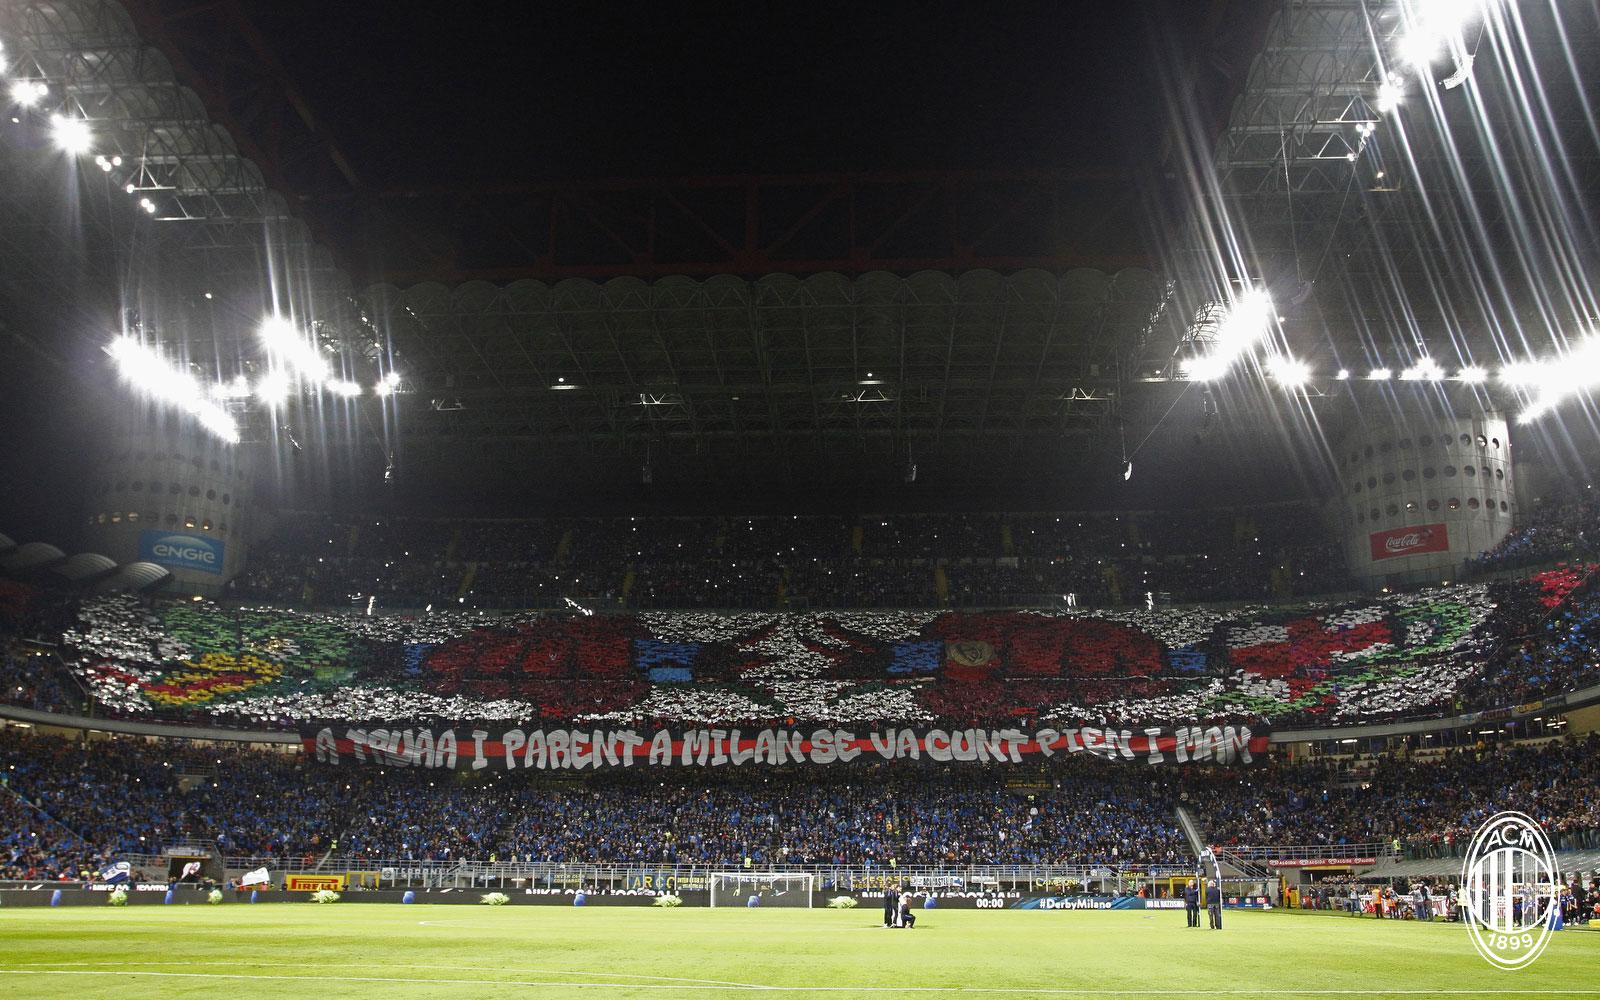 The tifo made by Milan fans during Inter-Milan at Stadio San Siro on October 21, 2018. (@acmilan.com)